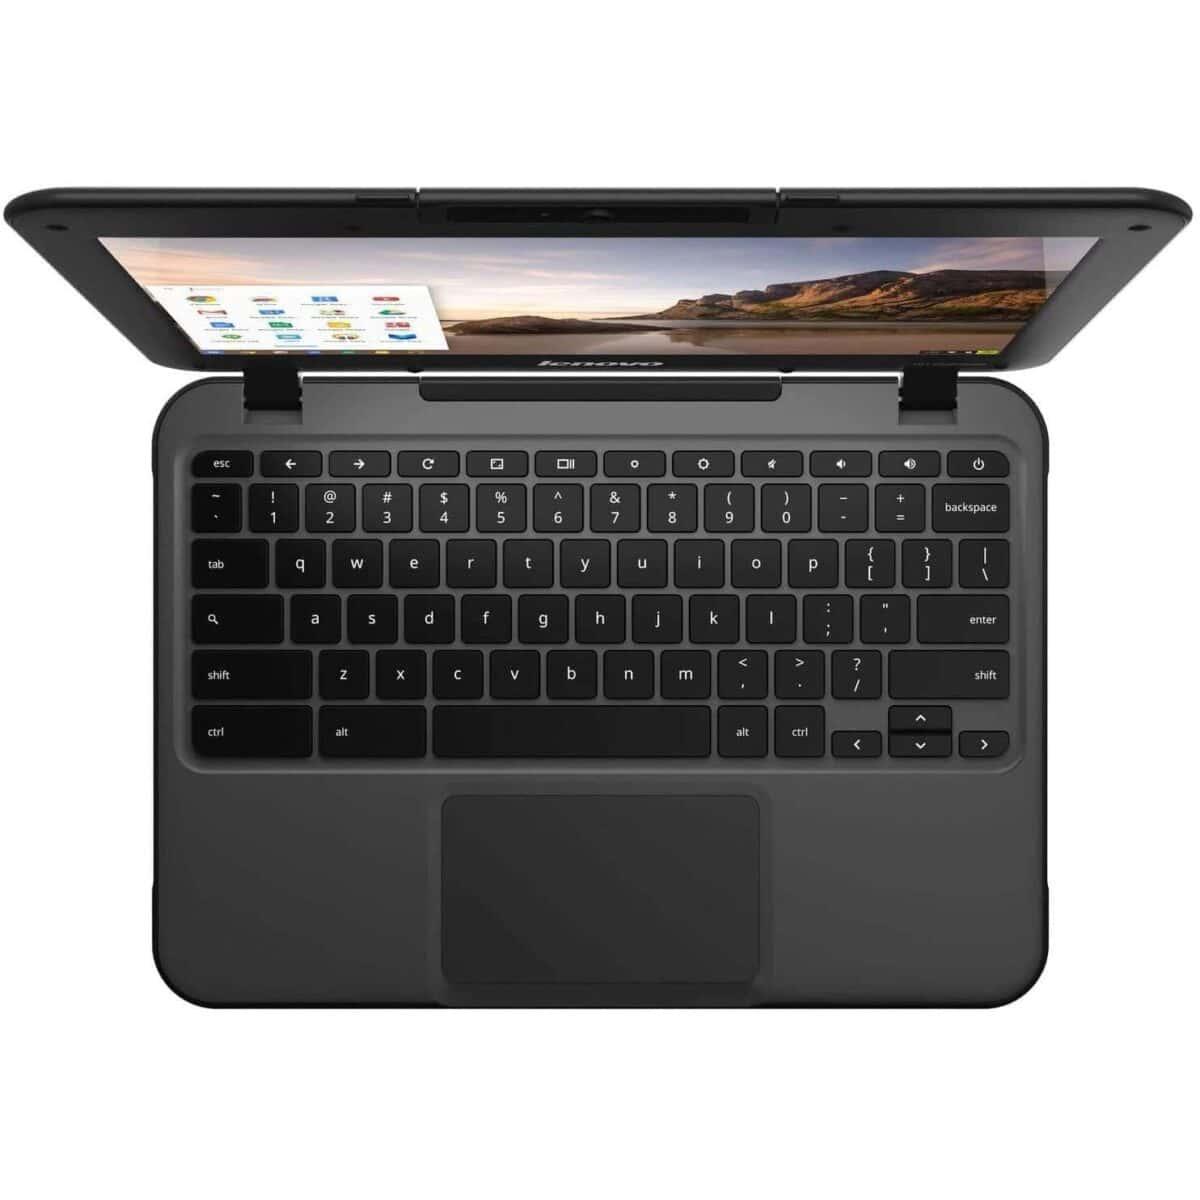 "Lenovo Chromebook Laptop Powerful 11.6"" 16GB 4GB Webcam HDMI Intel Chrome OS Black"